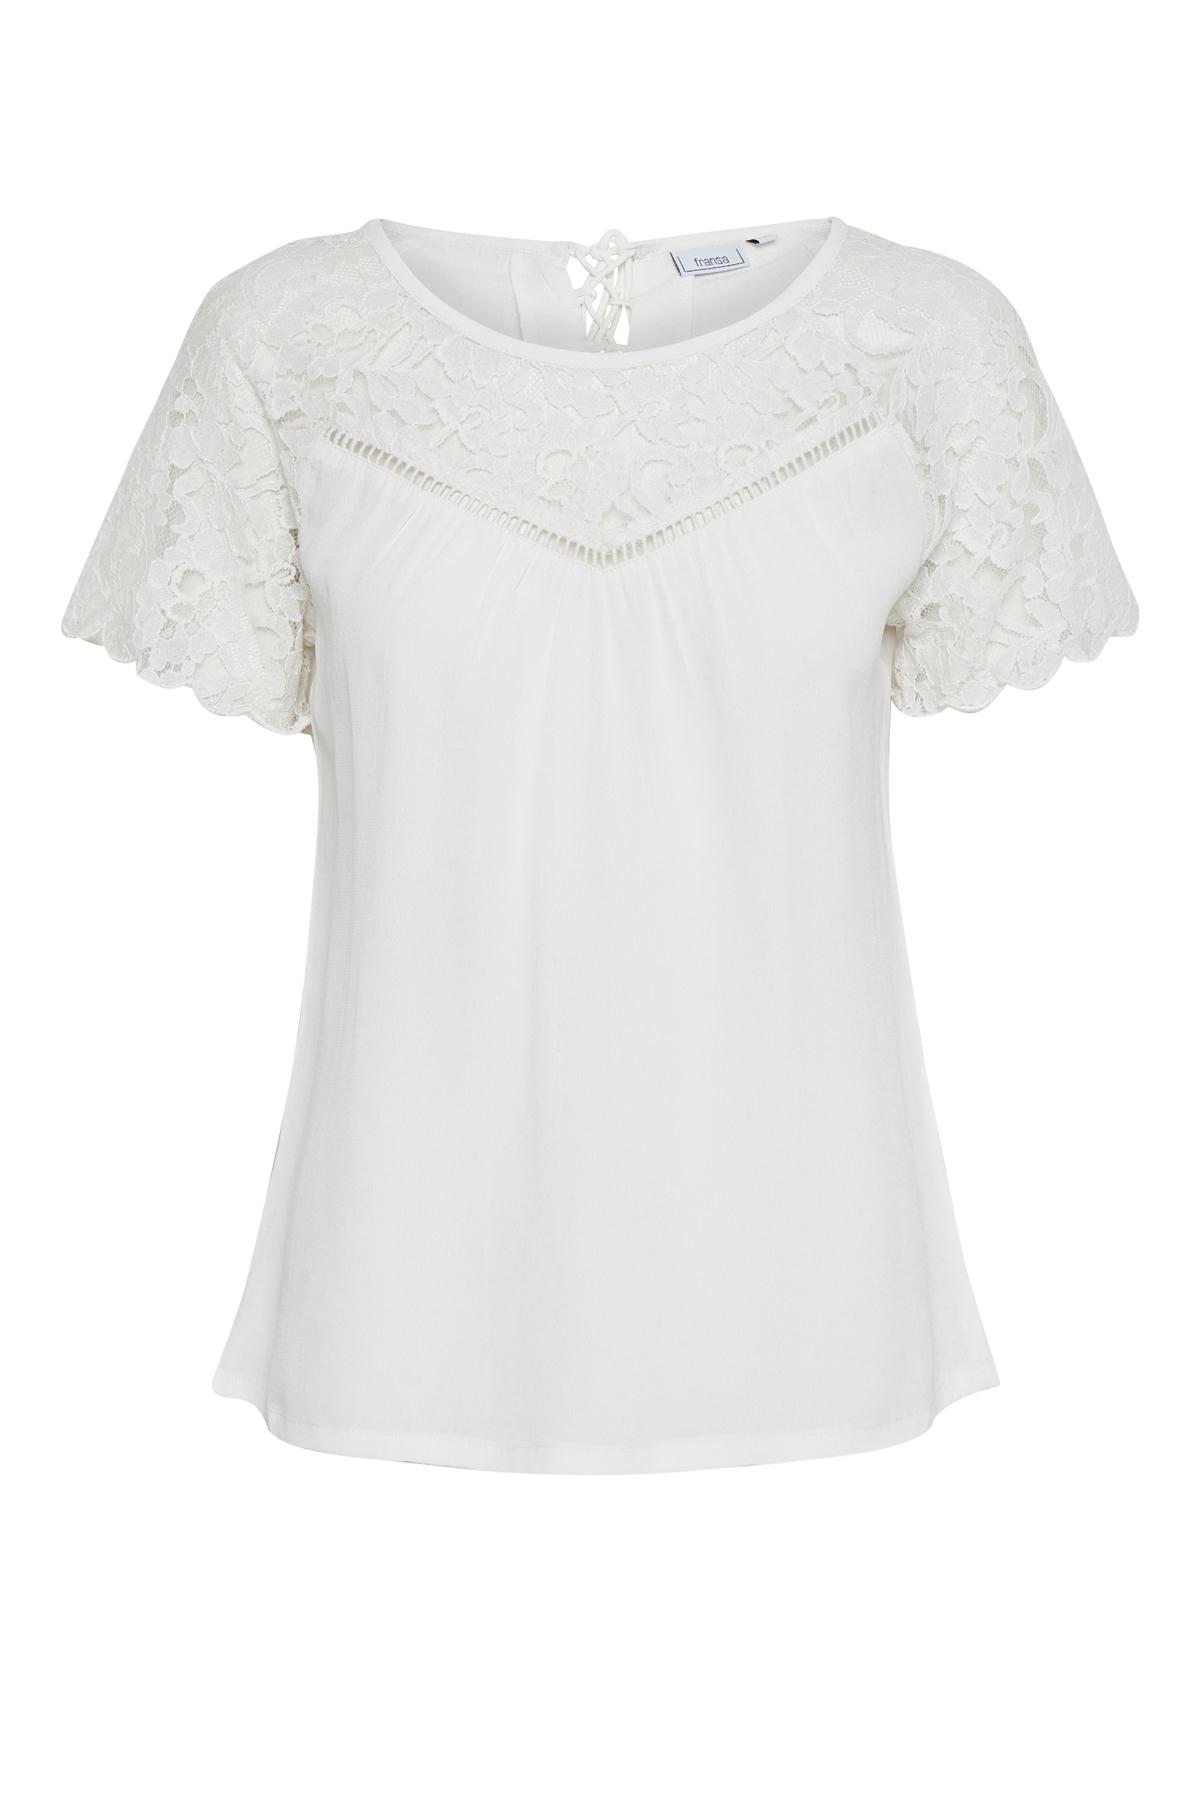 Off-white Kortærmet T-shirt fra Fransa – Køb Off-white Kortærmet T-shirt fra str. XS-XXL her